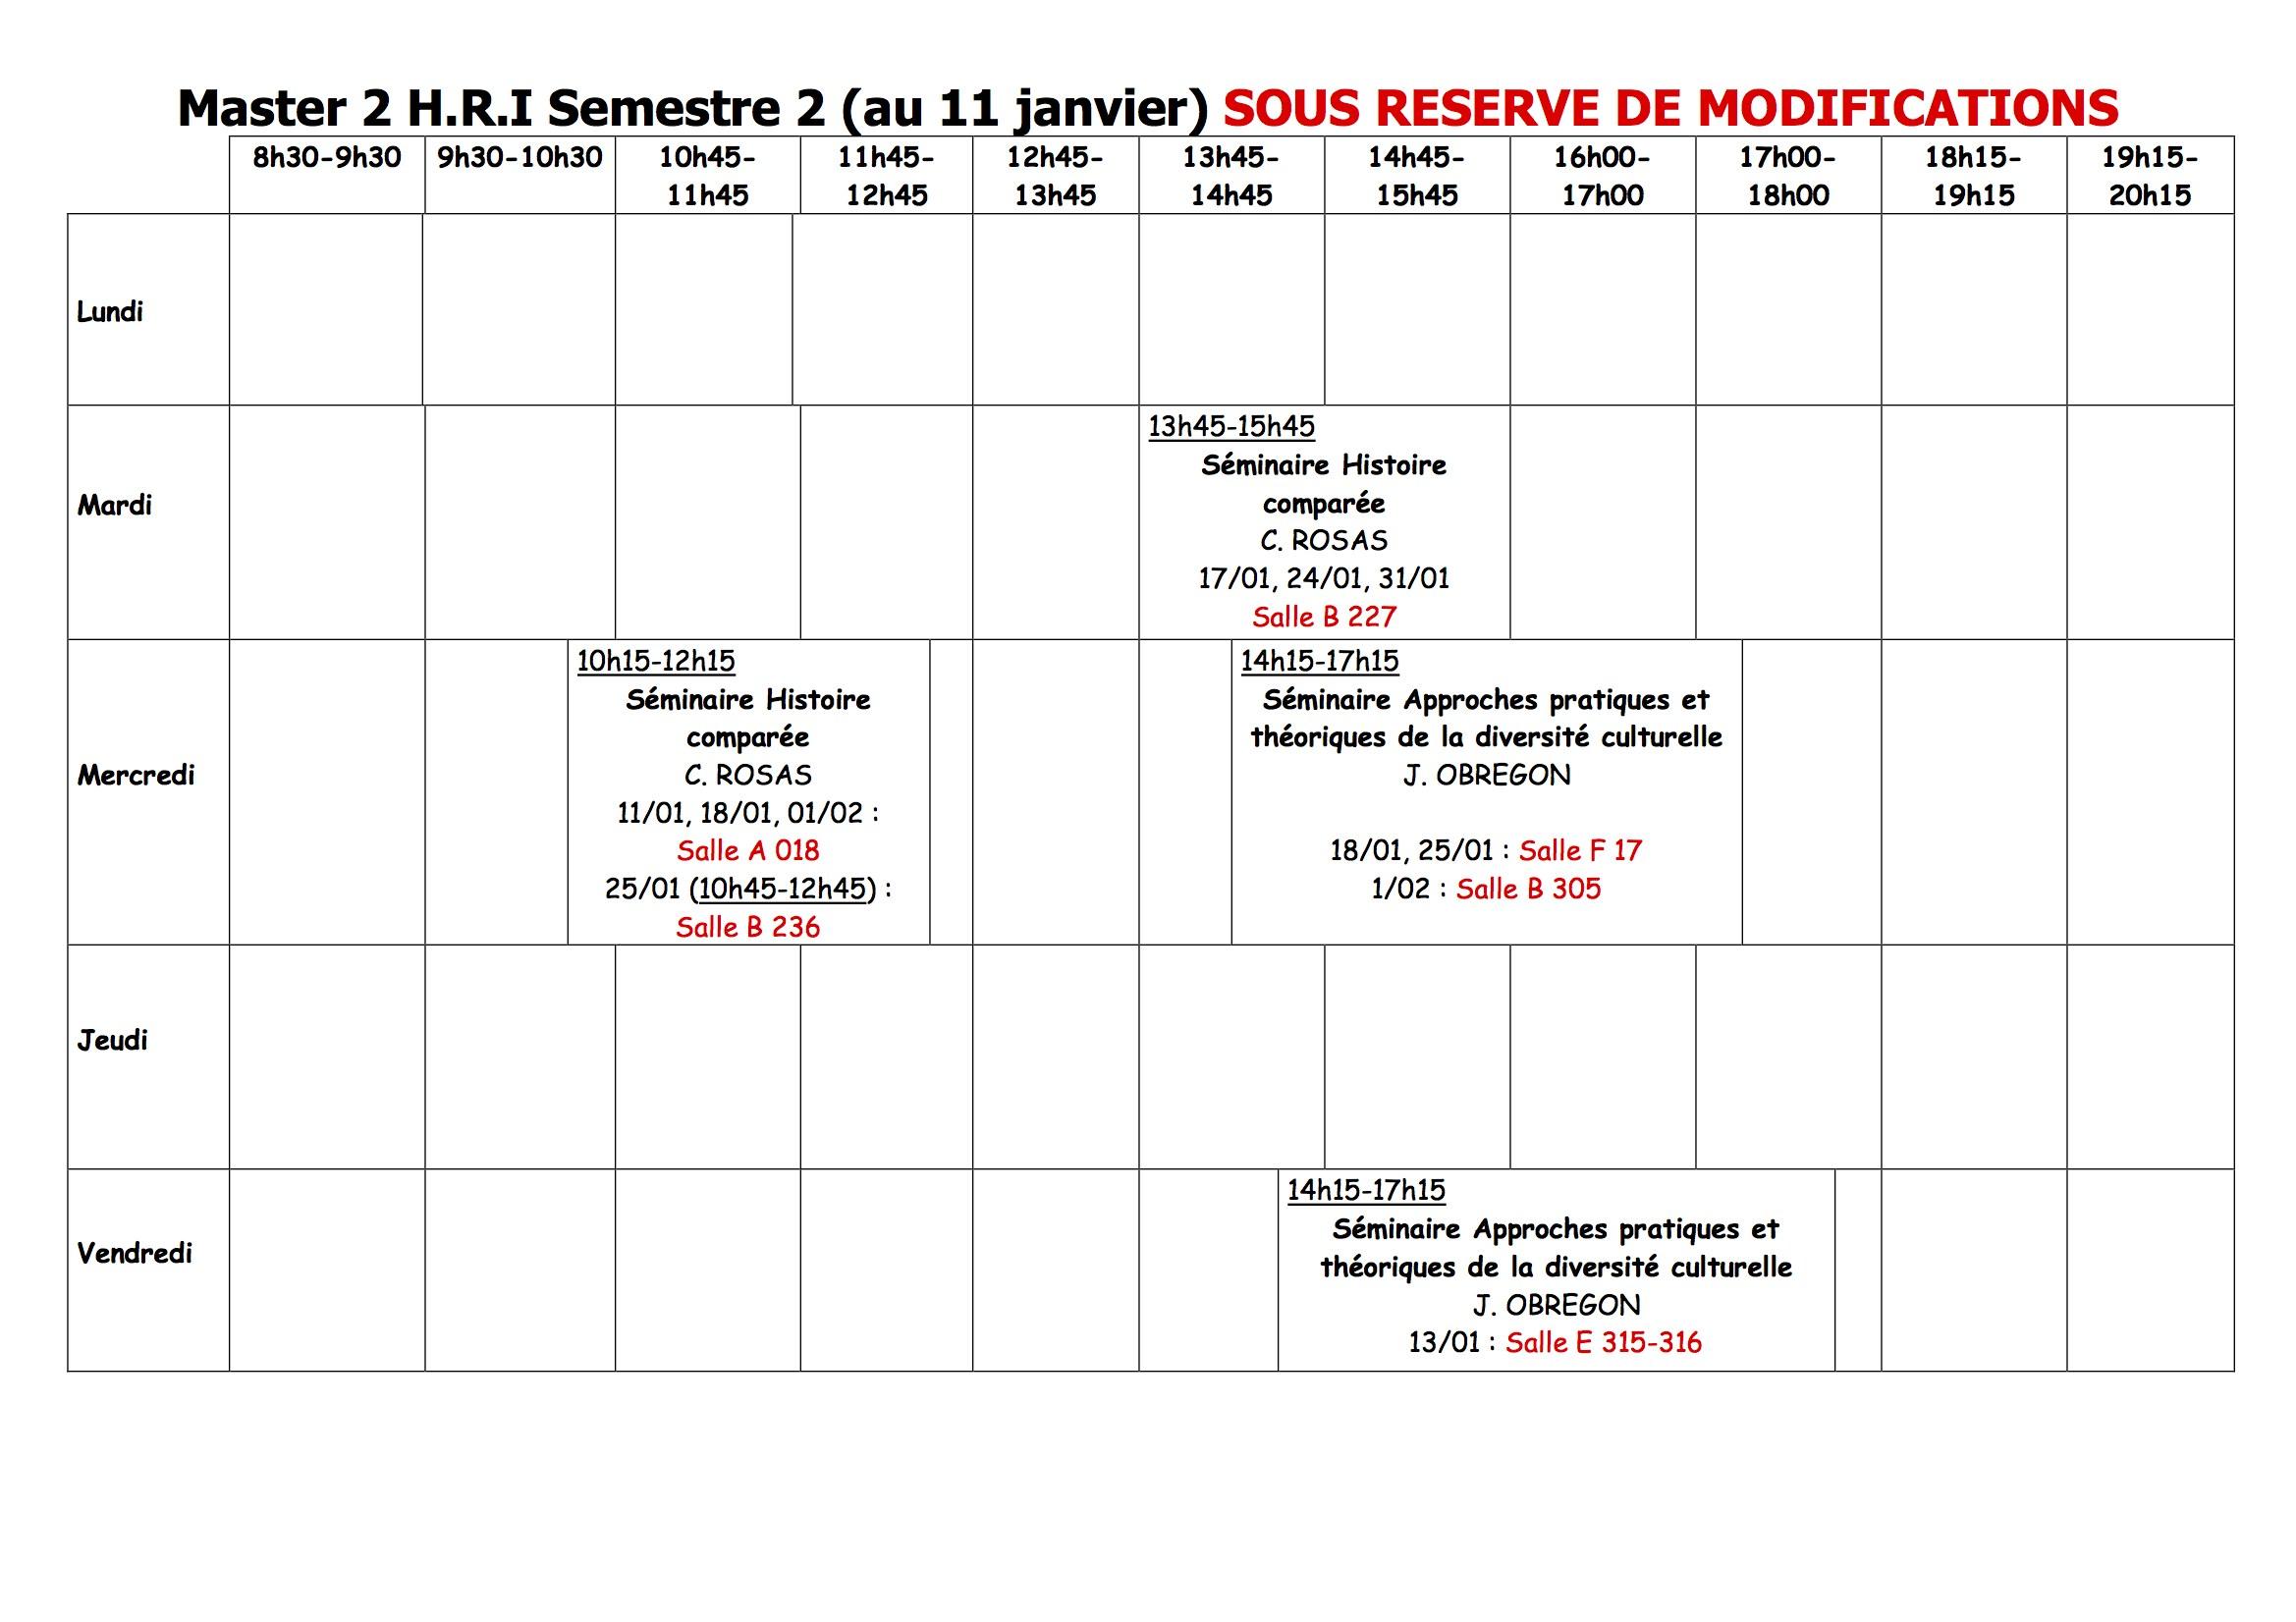 m2-hri-semestre-2-au-11-janvier_corrige